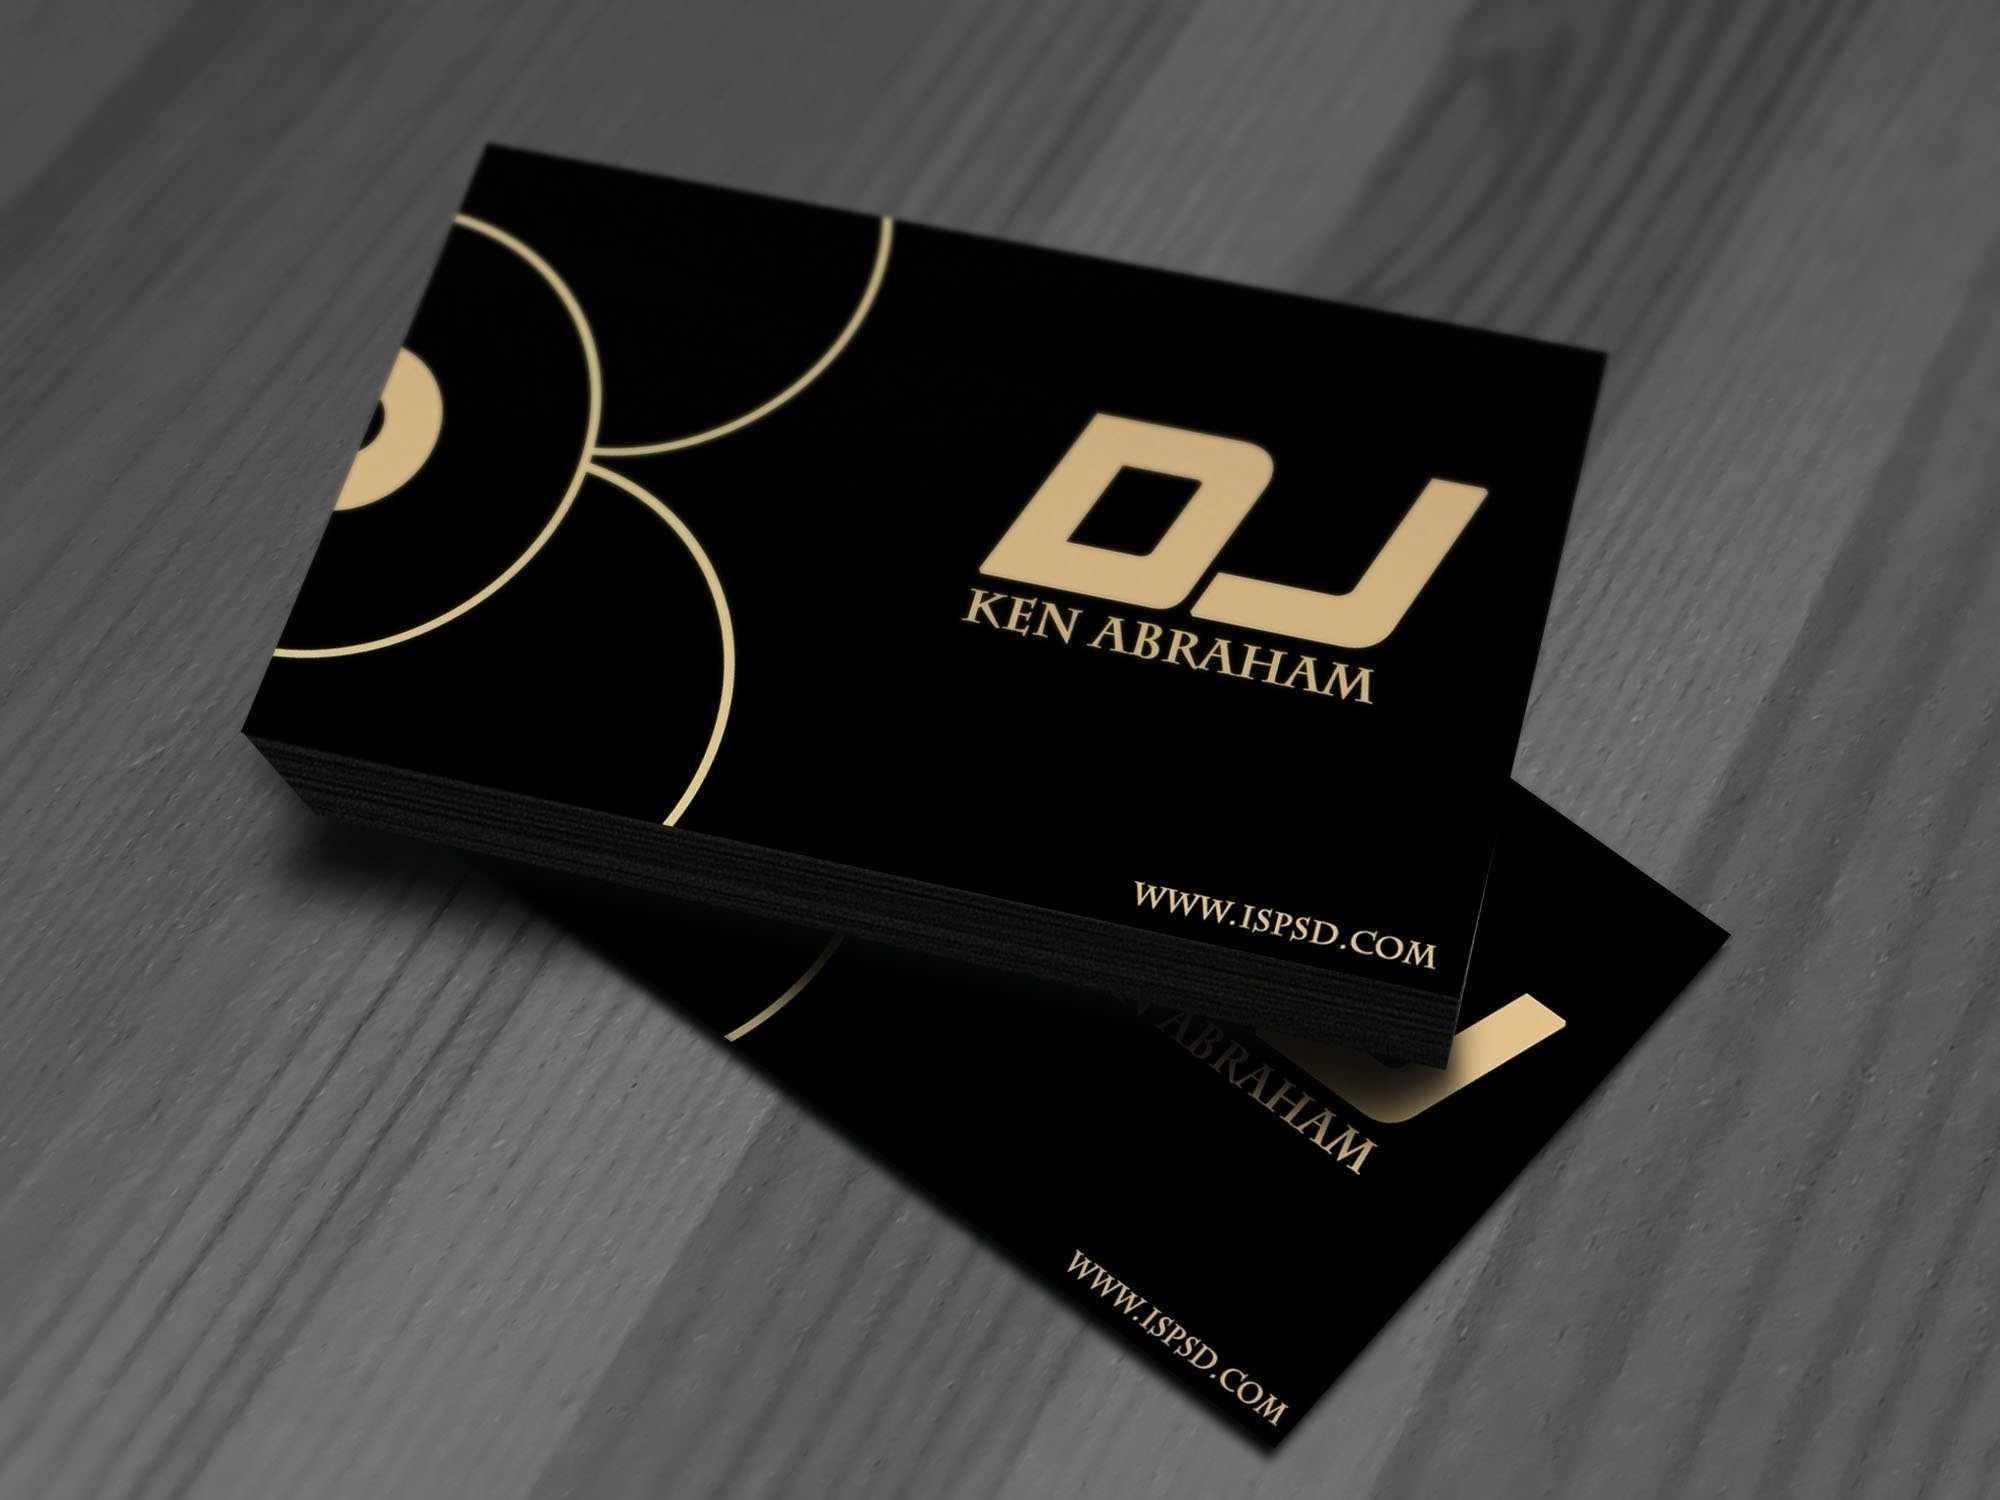 59 Free Printable Business Card Templates Dj Free Maker by Business Card Templates Dj Free